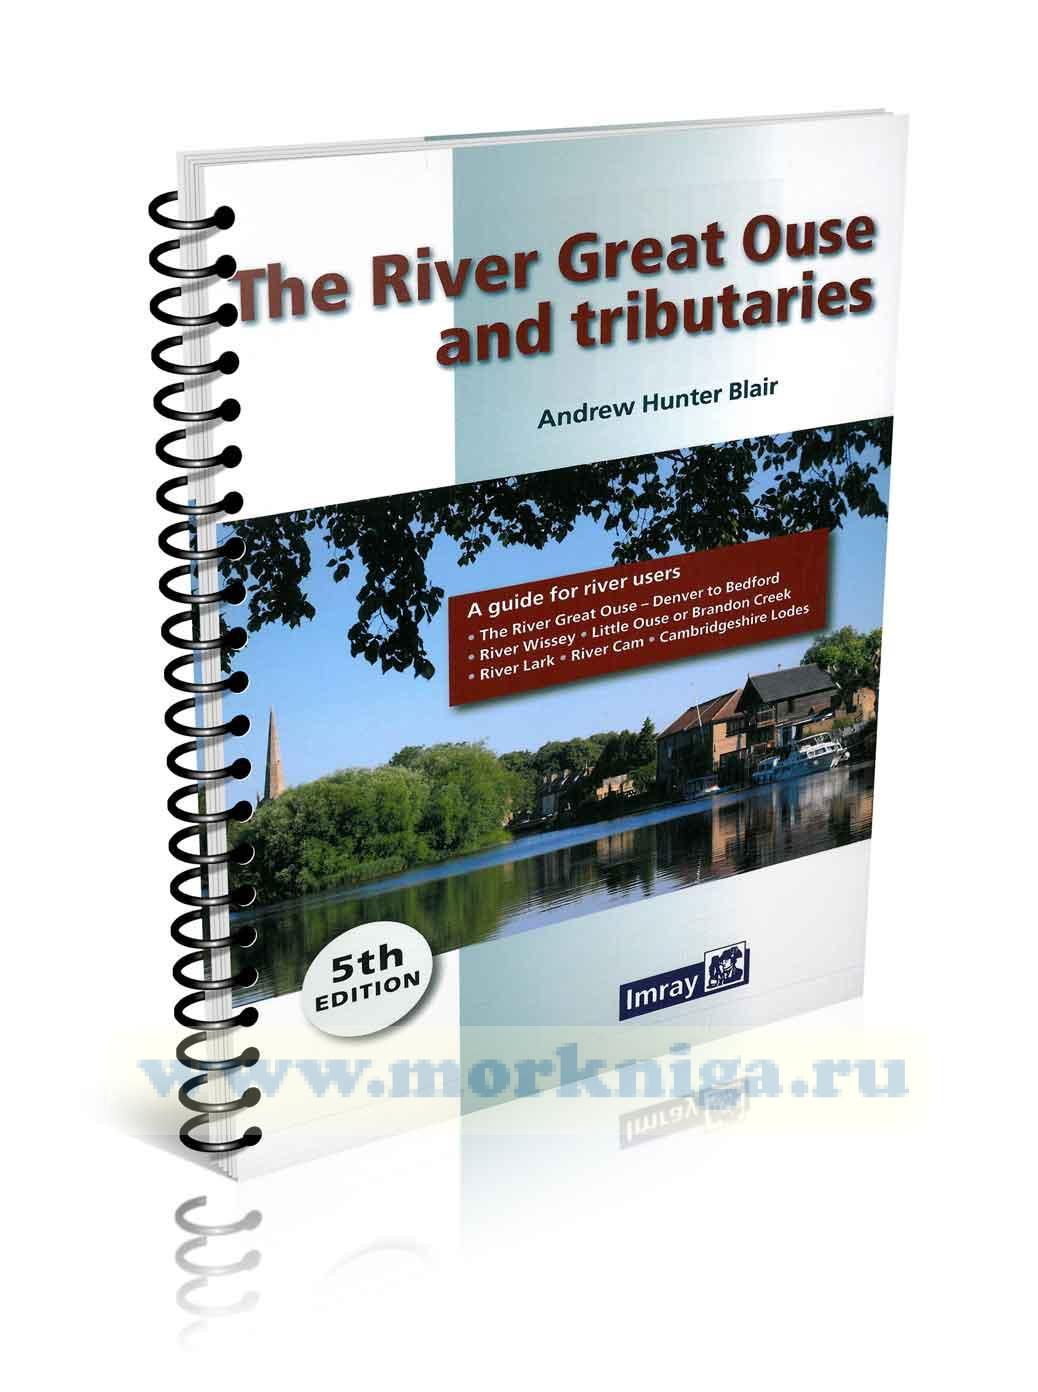 The river Great Ouse and tributaries 5th edition Река Грейт-Уз с притоками. Руководство для судоводителей